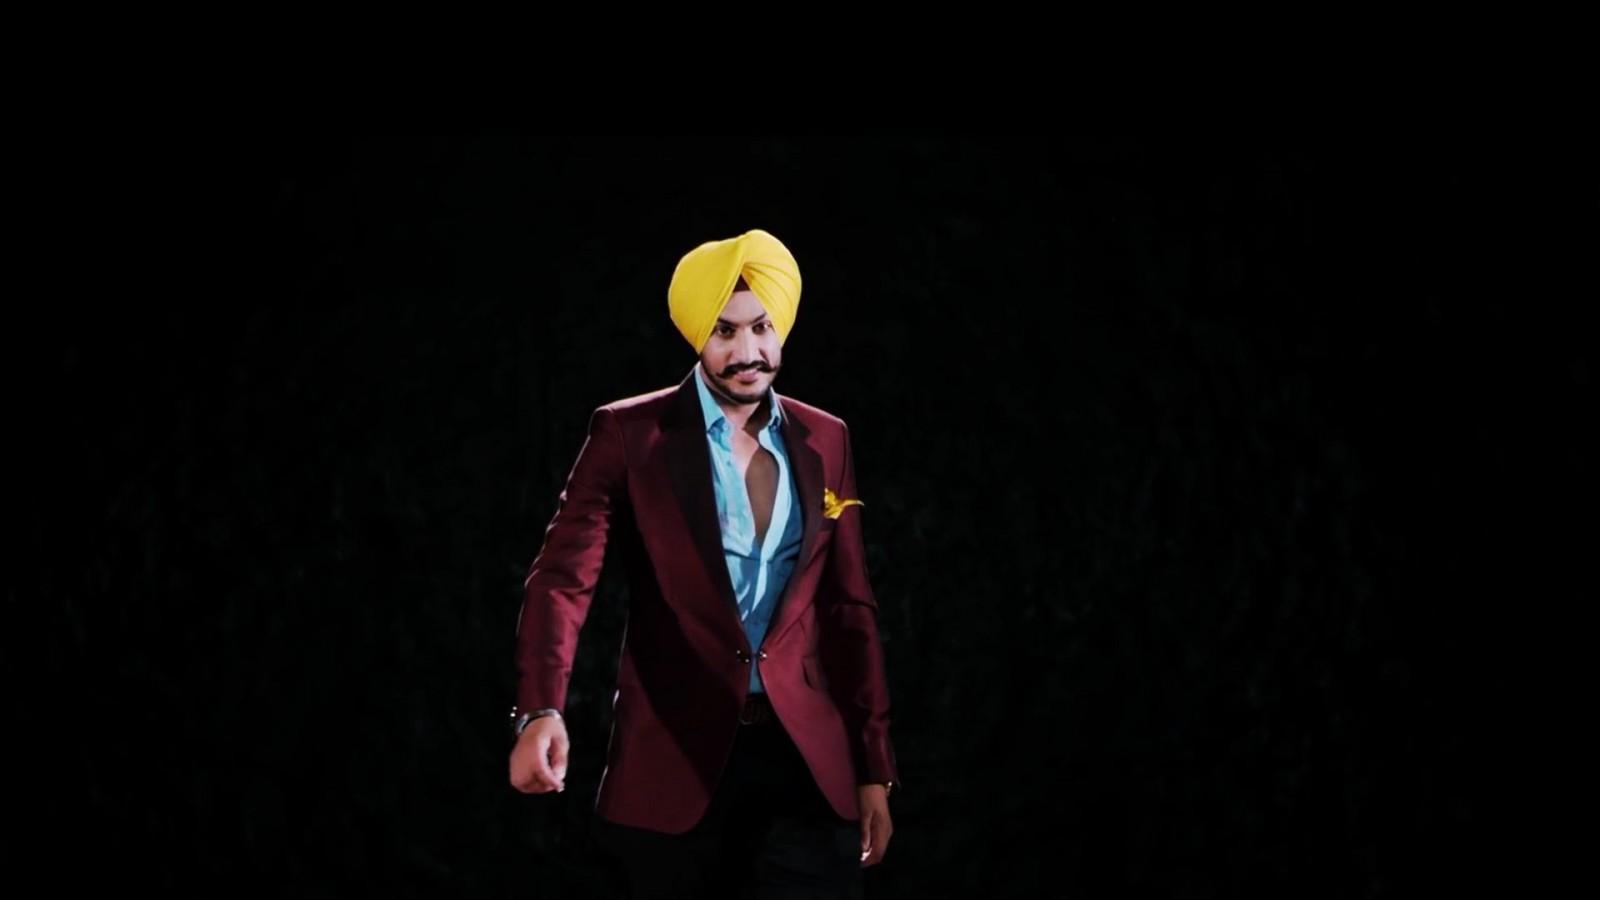 Rajvir Jawanda Yellow Turban Purple Suit Wallpaper 10342   Baltana 1600x900